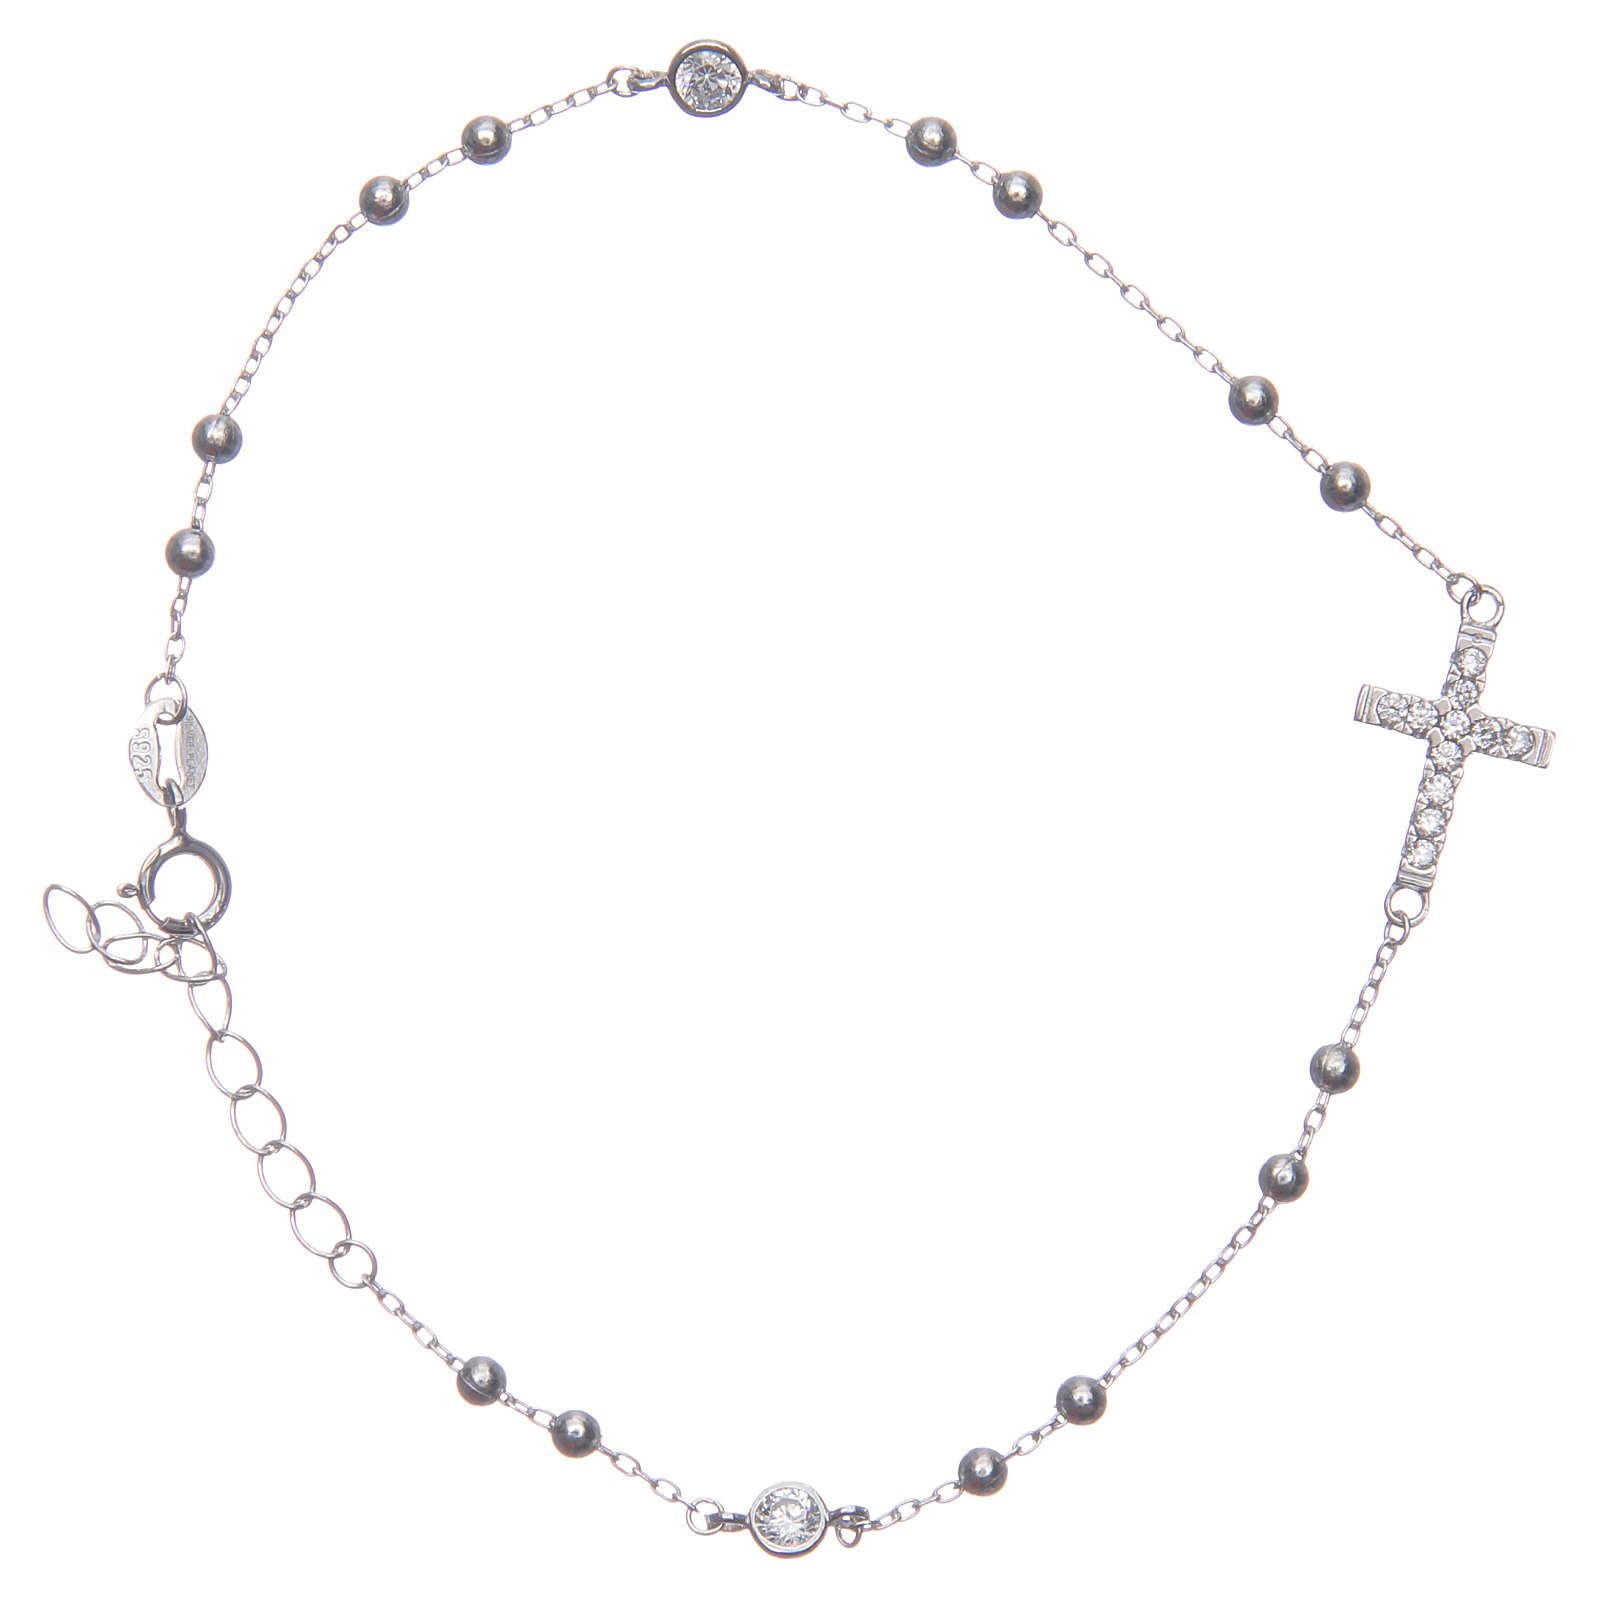 Bracciale rosario Santa Rita silver zirconi bianchi argento 925 4